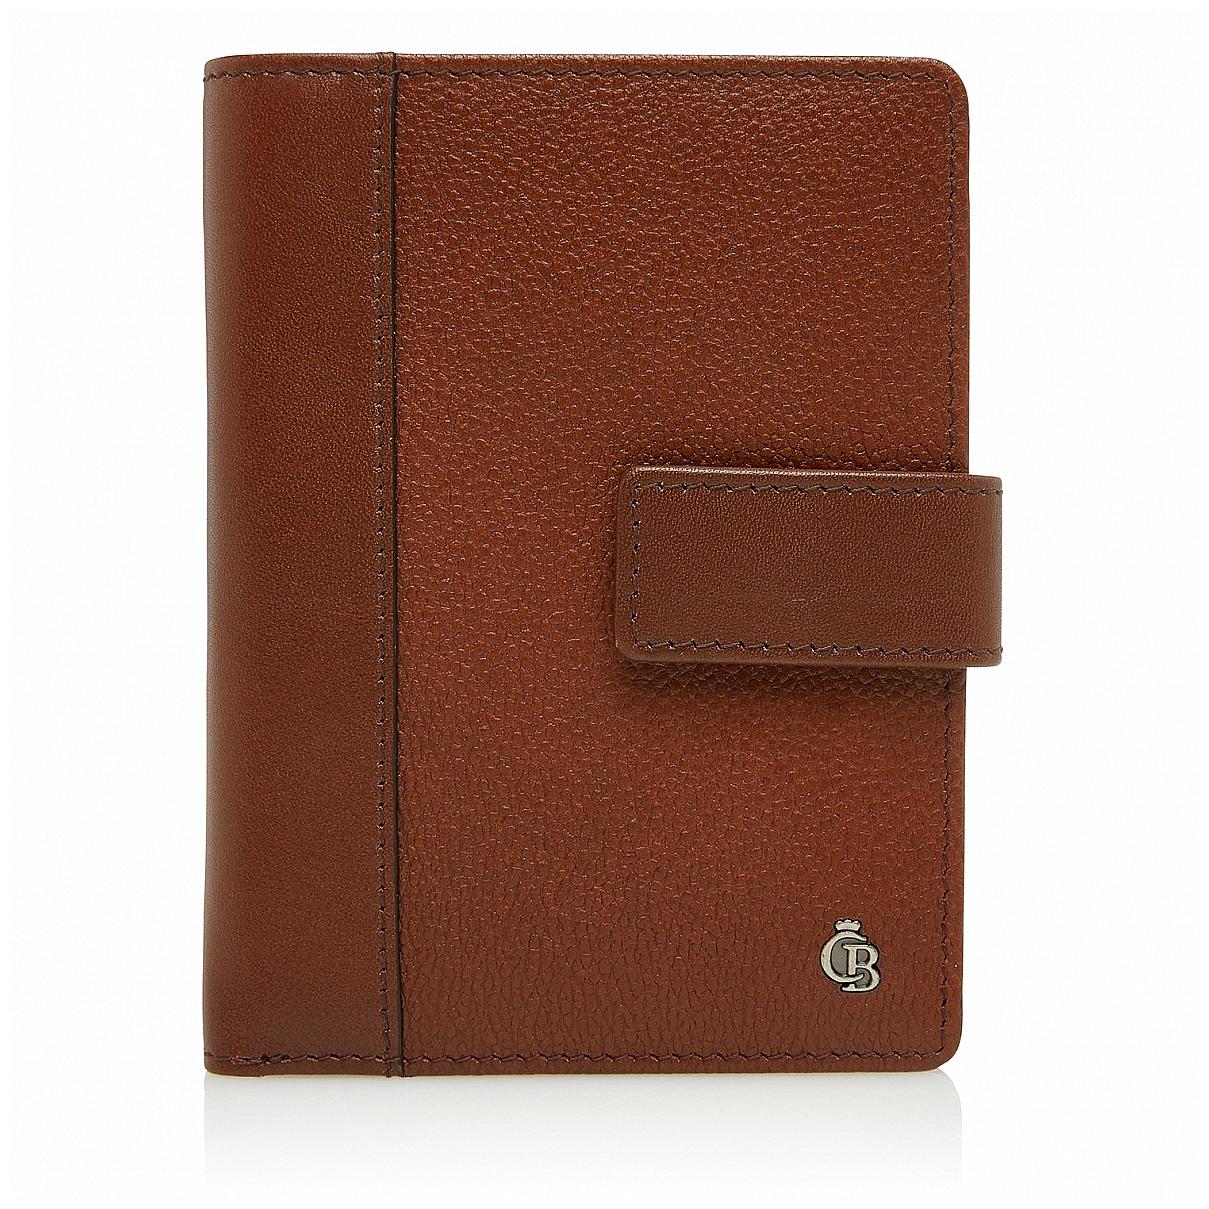 Castelijn & Beerens Pánská kožená peněženka RFID 695415 koňak